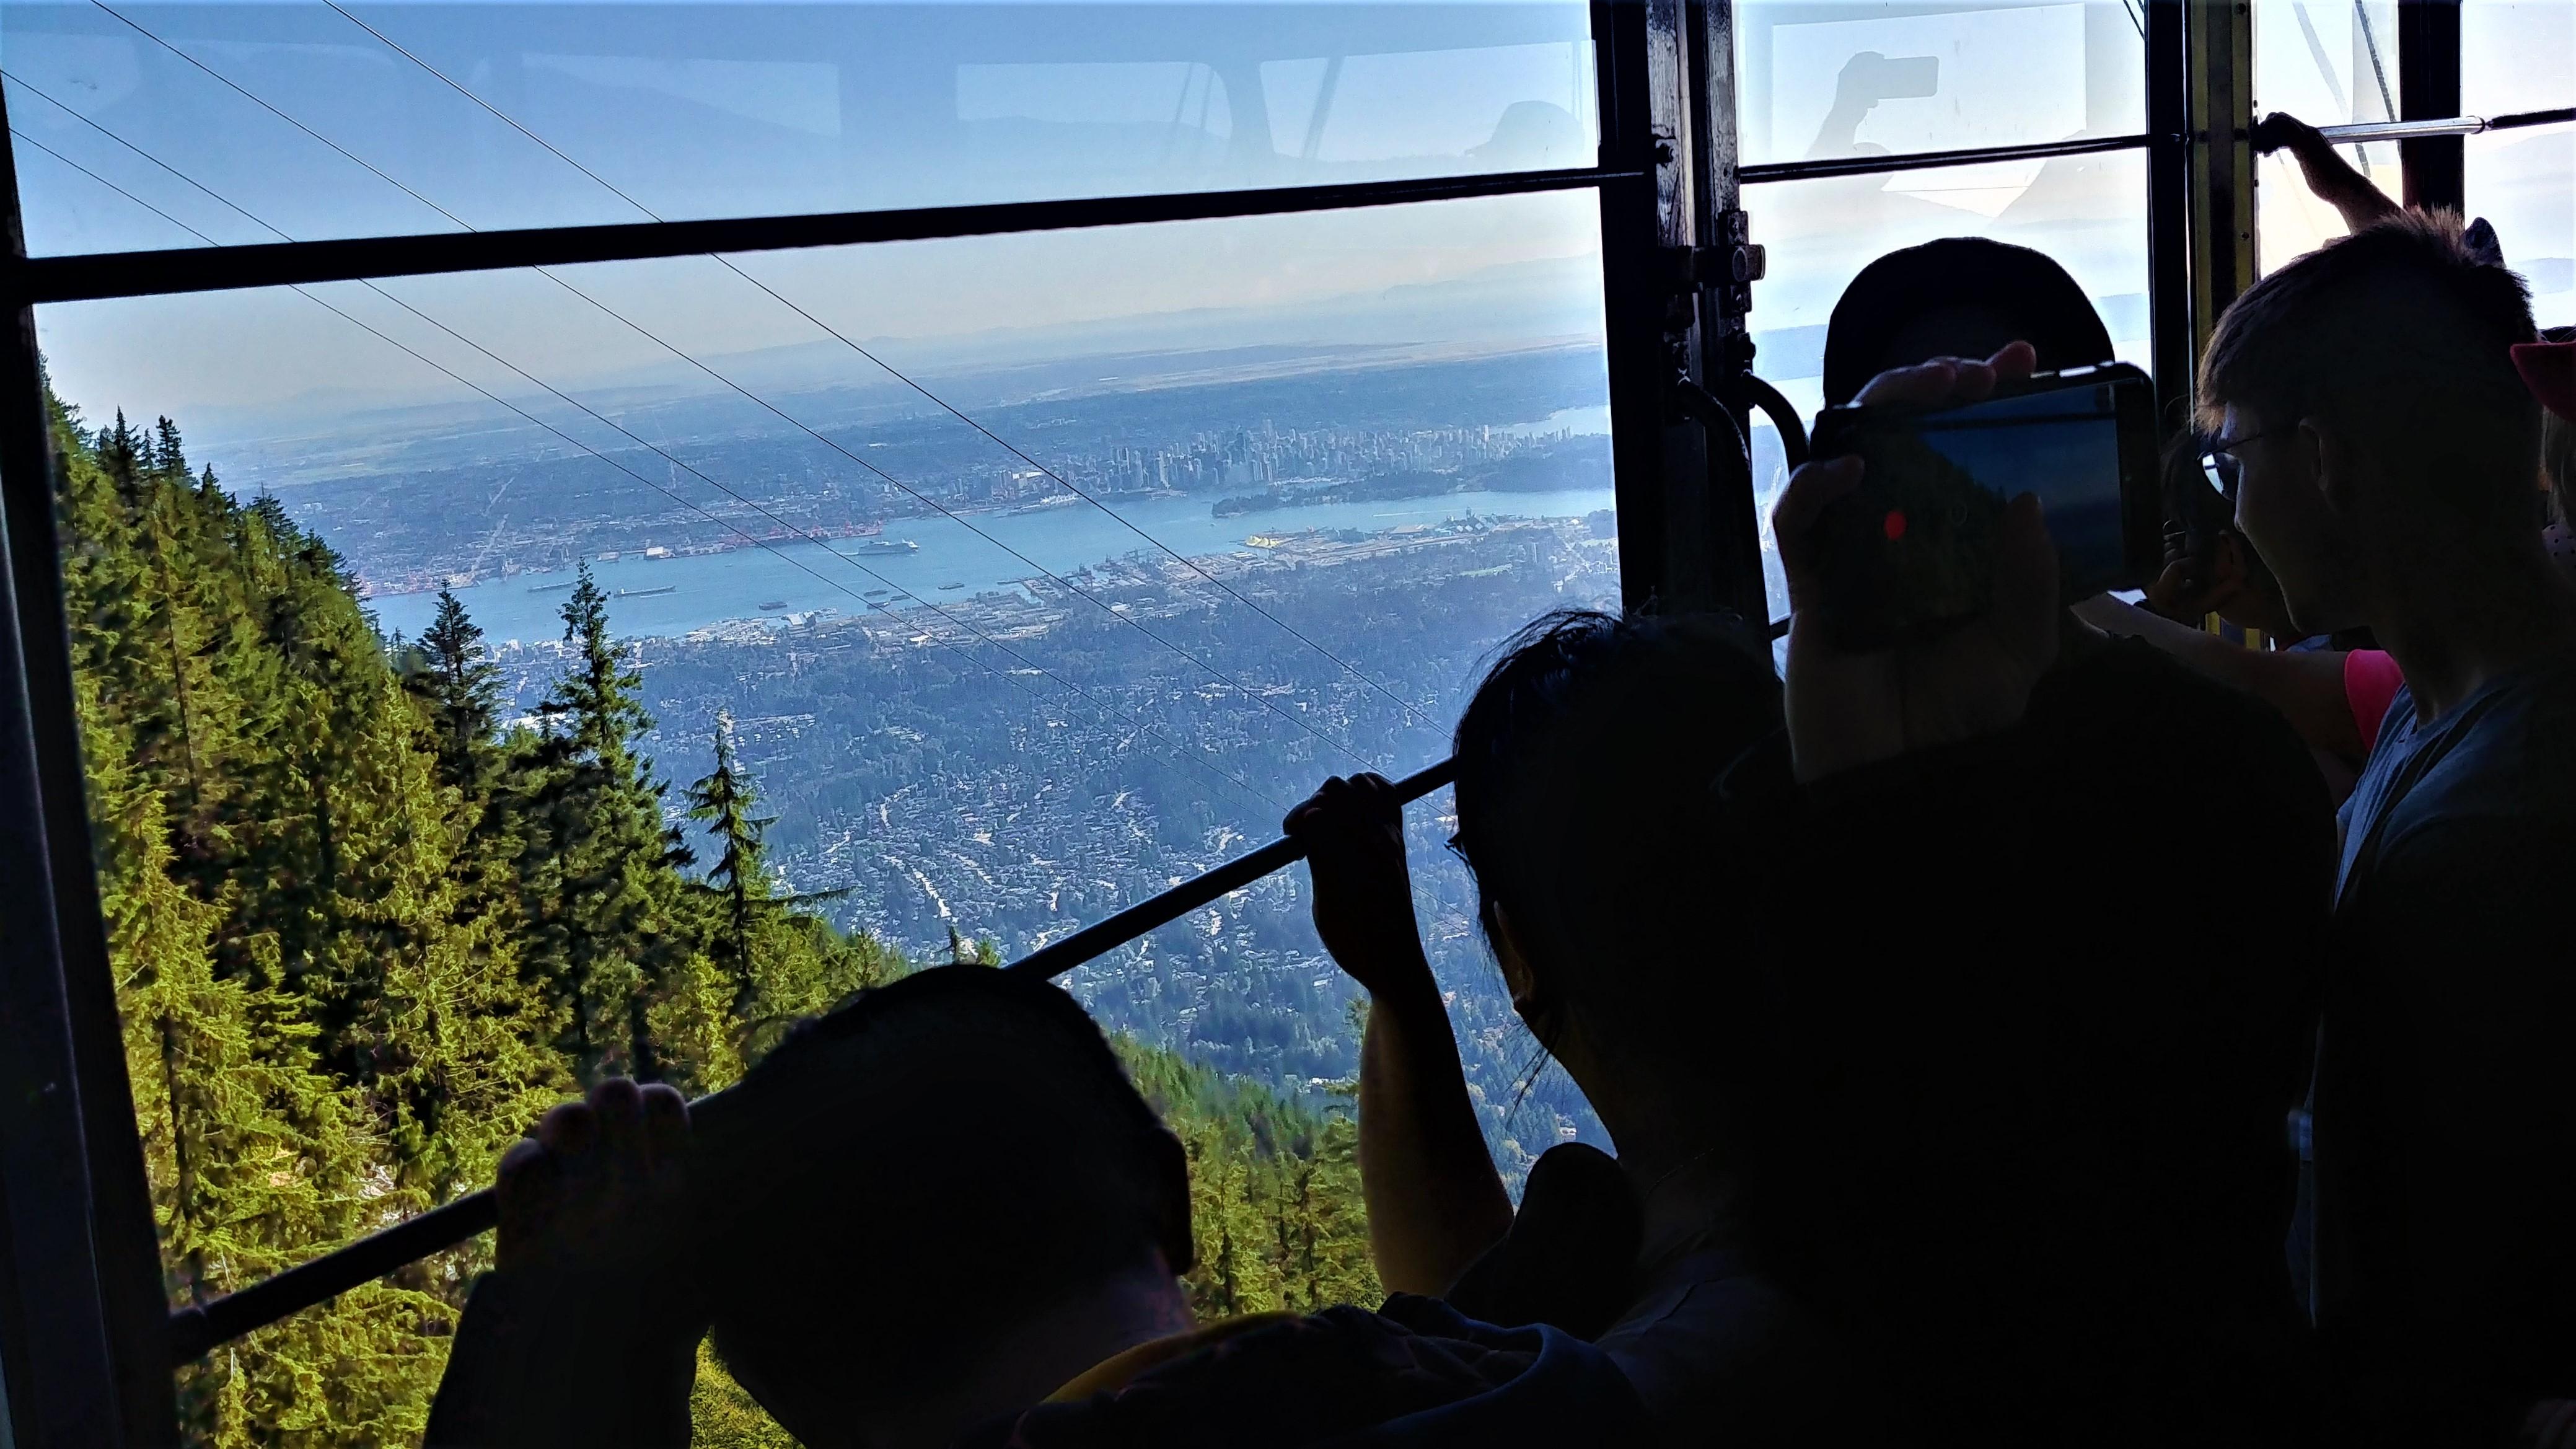 Vancouver Grouse Mountain gondola infos pratiques Grouse grind